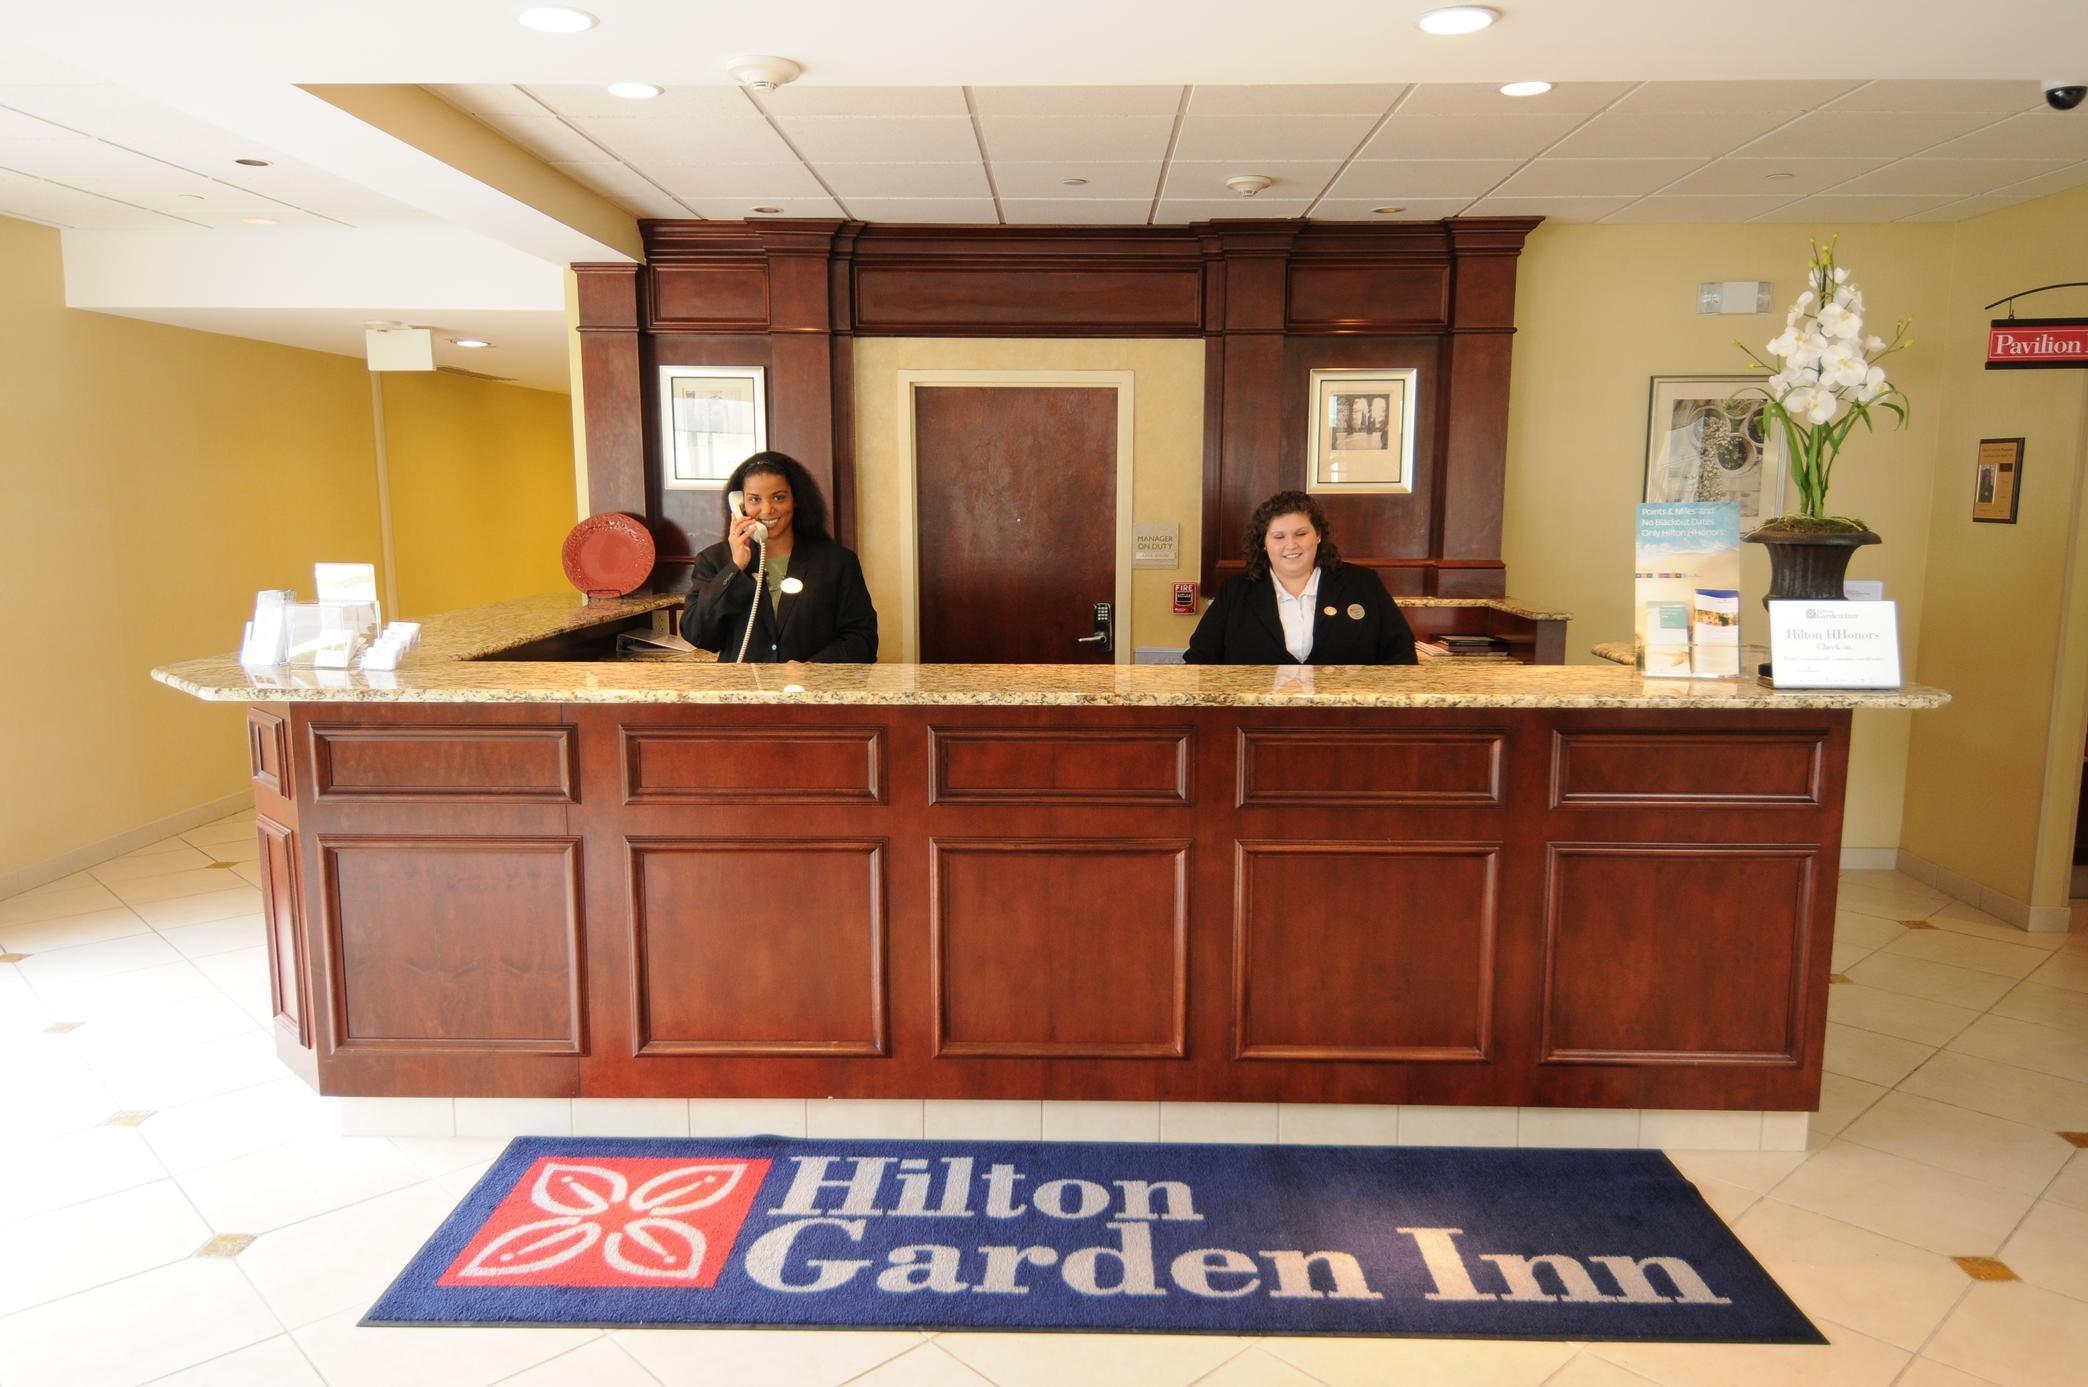 Hilton Garden Inn Morgantown In Morgantown Wv 26505